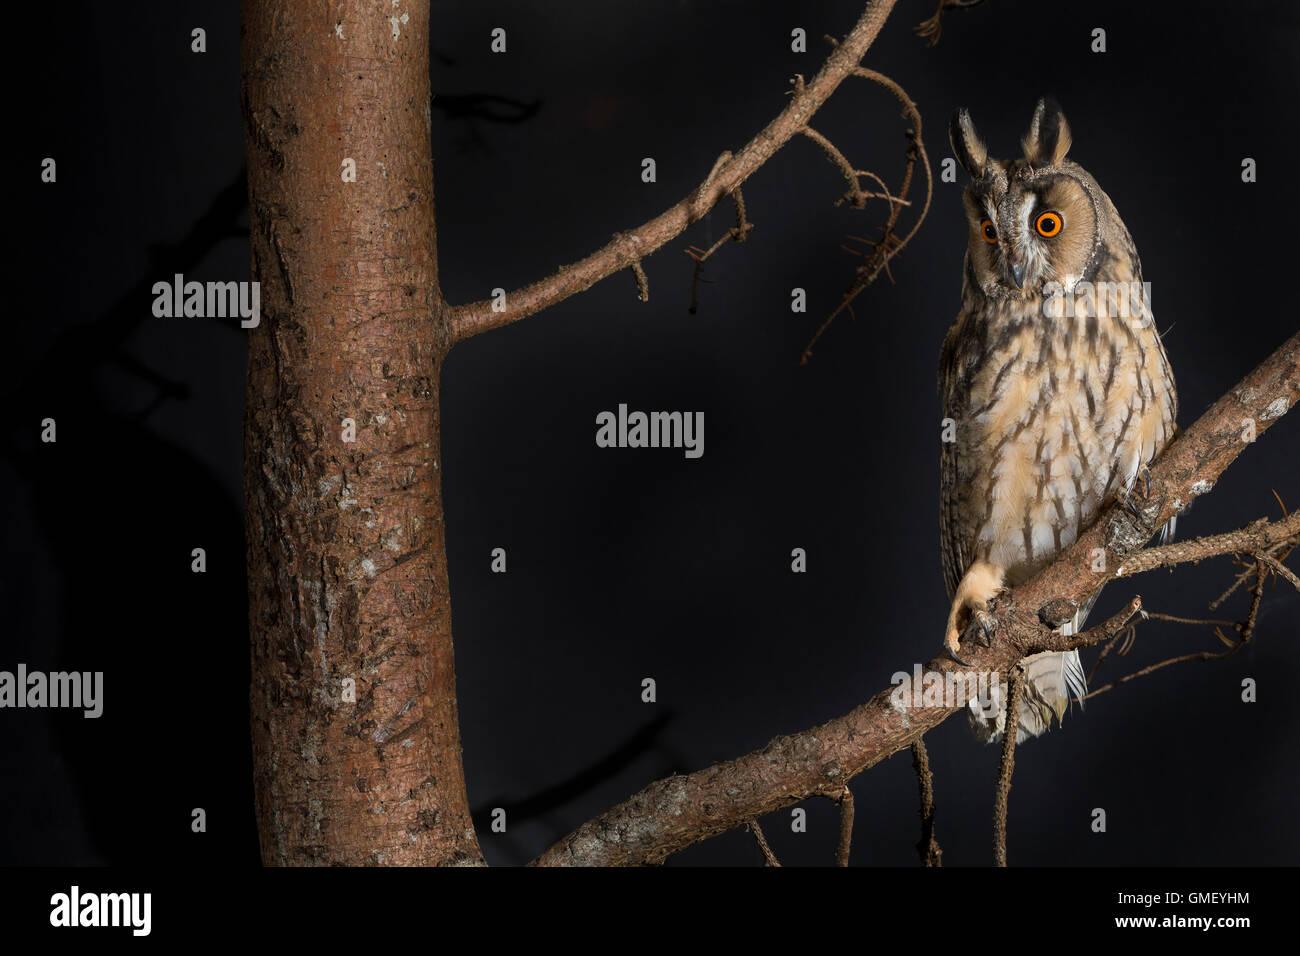 Waldohreule, Waldohr-Eule, Asio otus, long-eared owl, Le Hibou moyen-duc Stock Photo